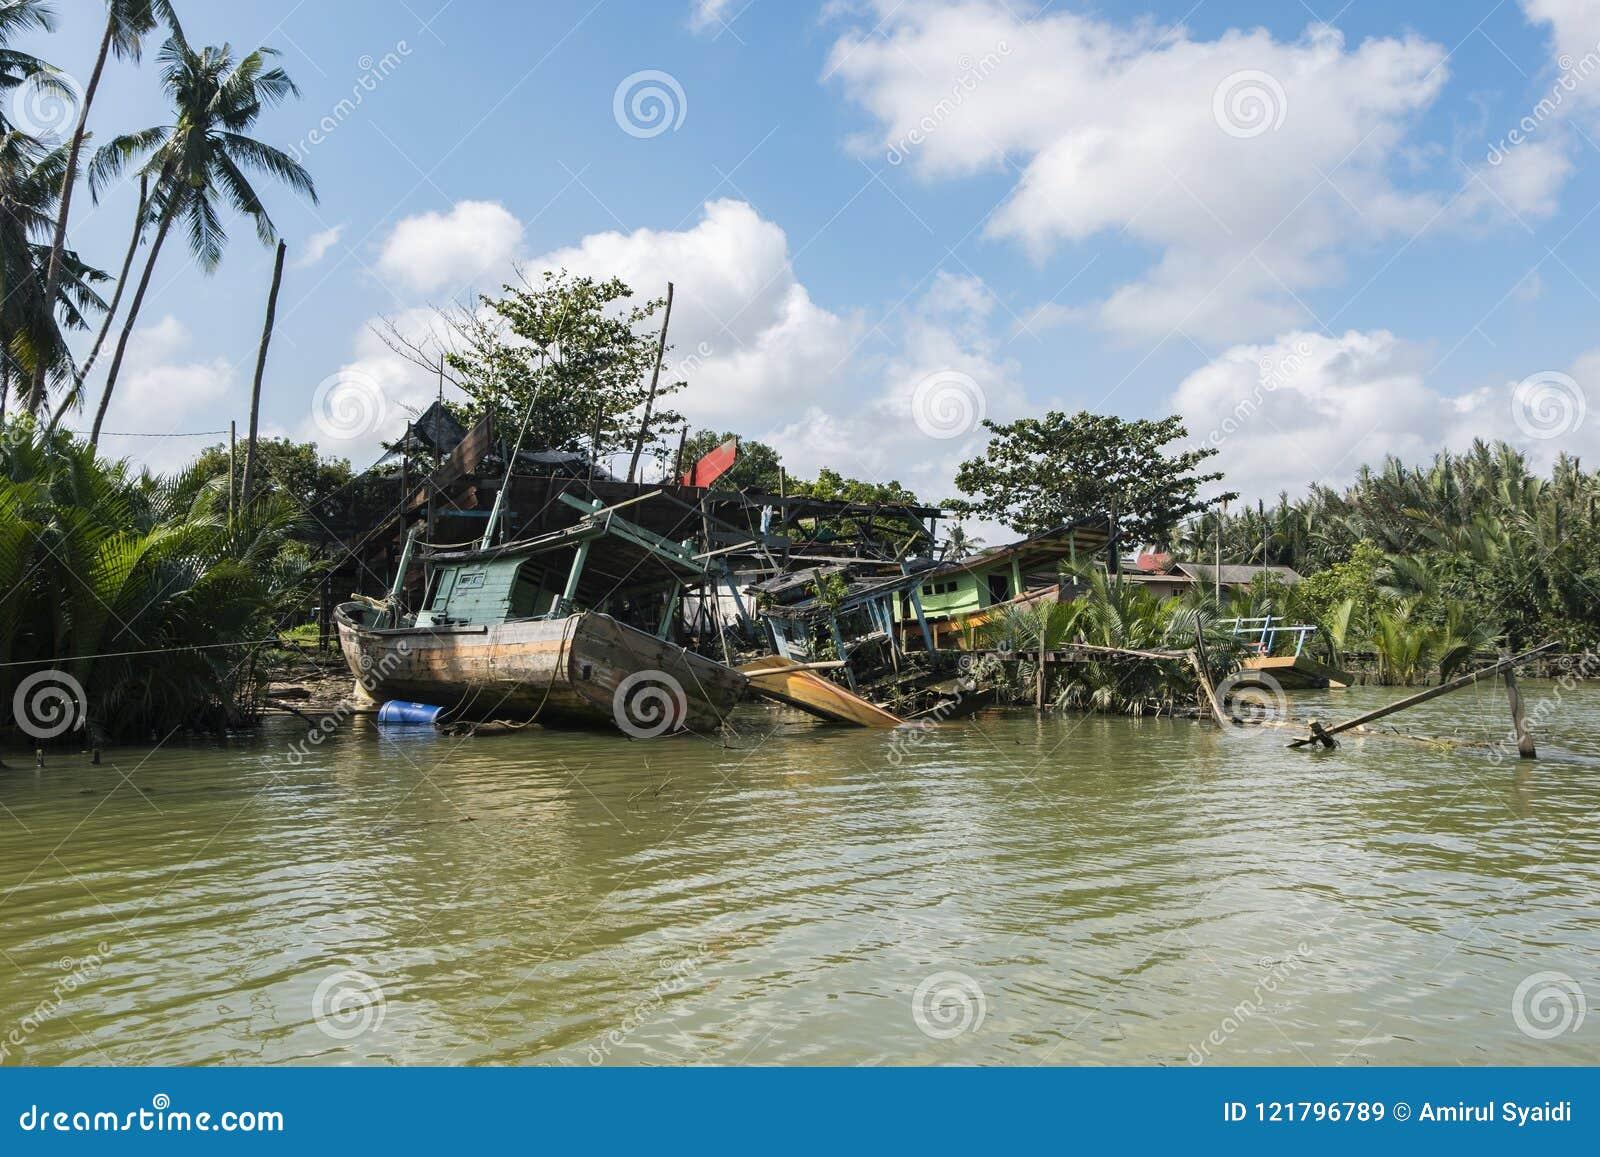 Dilapidated abandon fisherman boat stranded near the riverside a